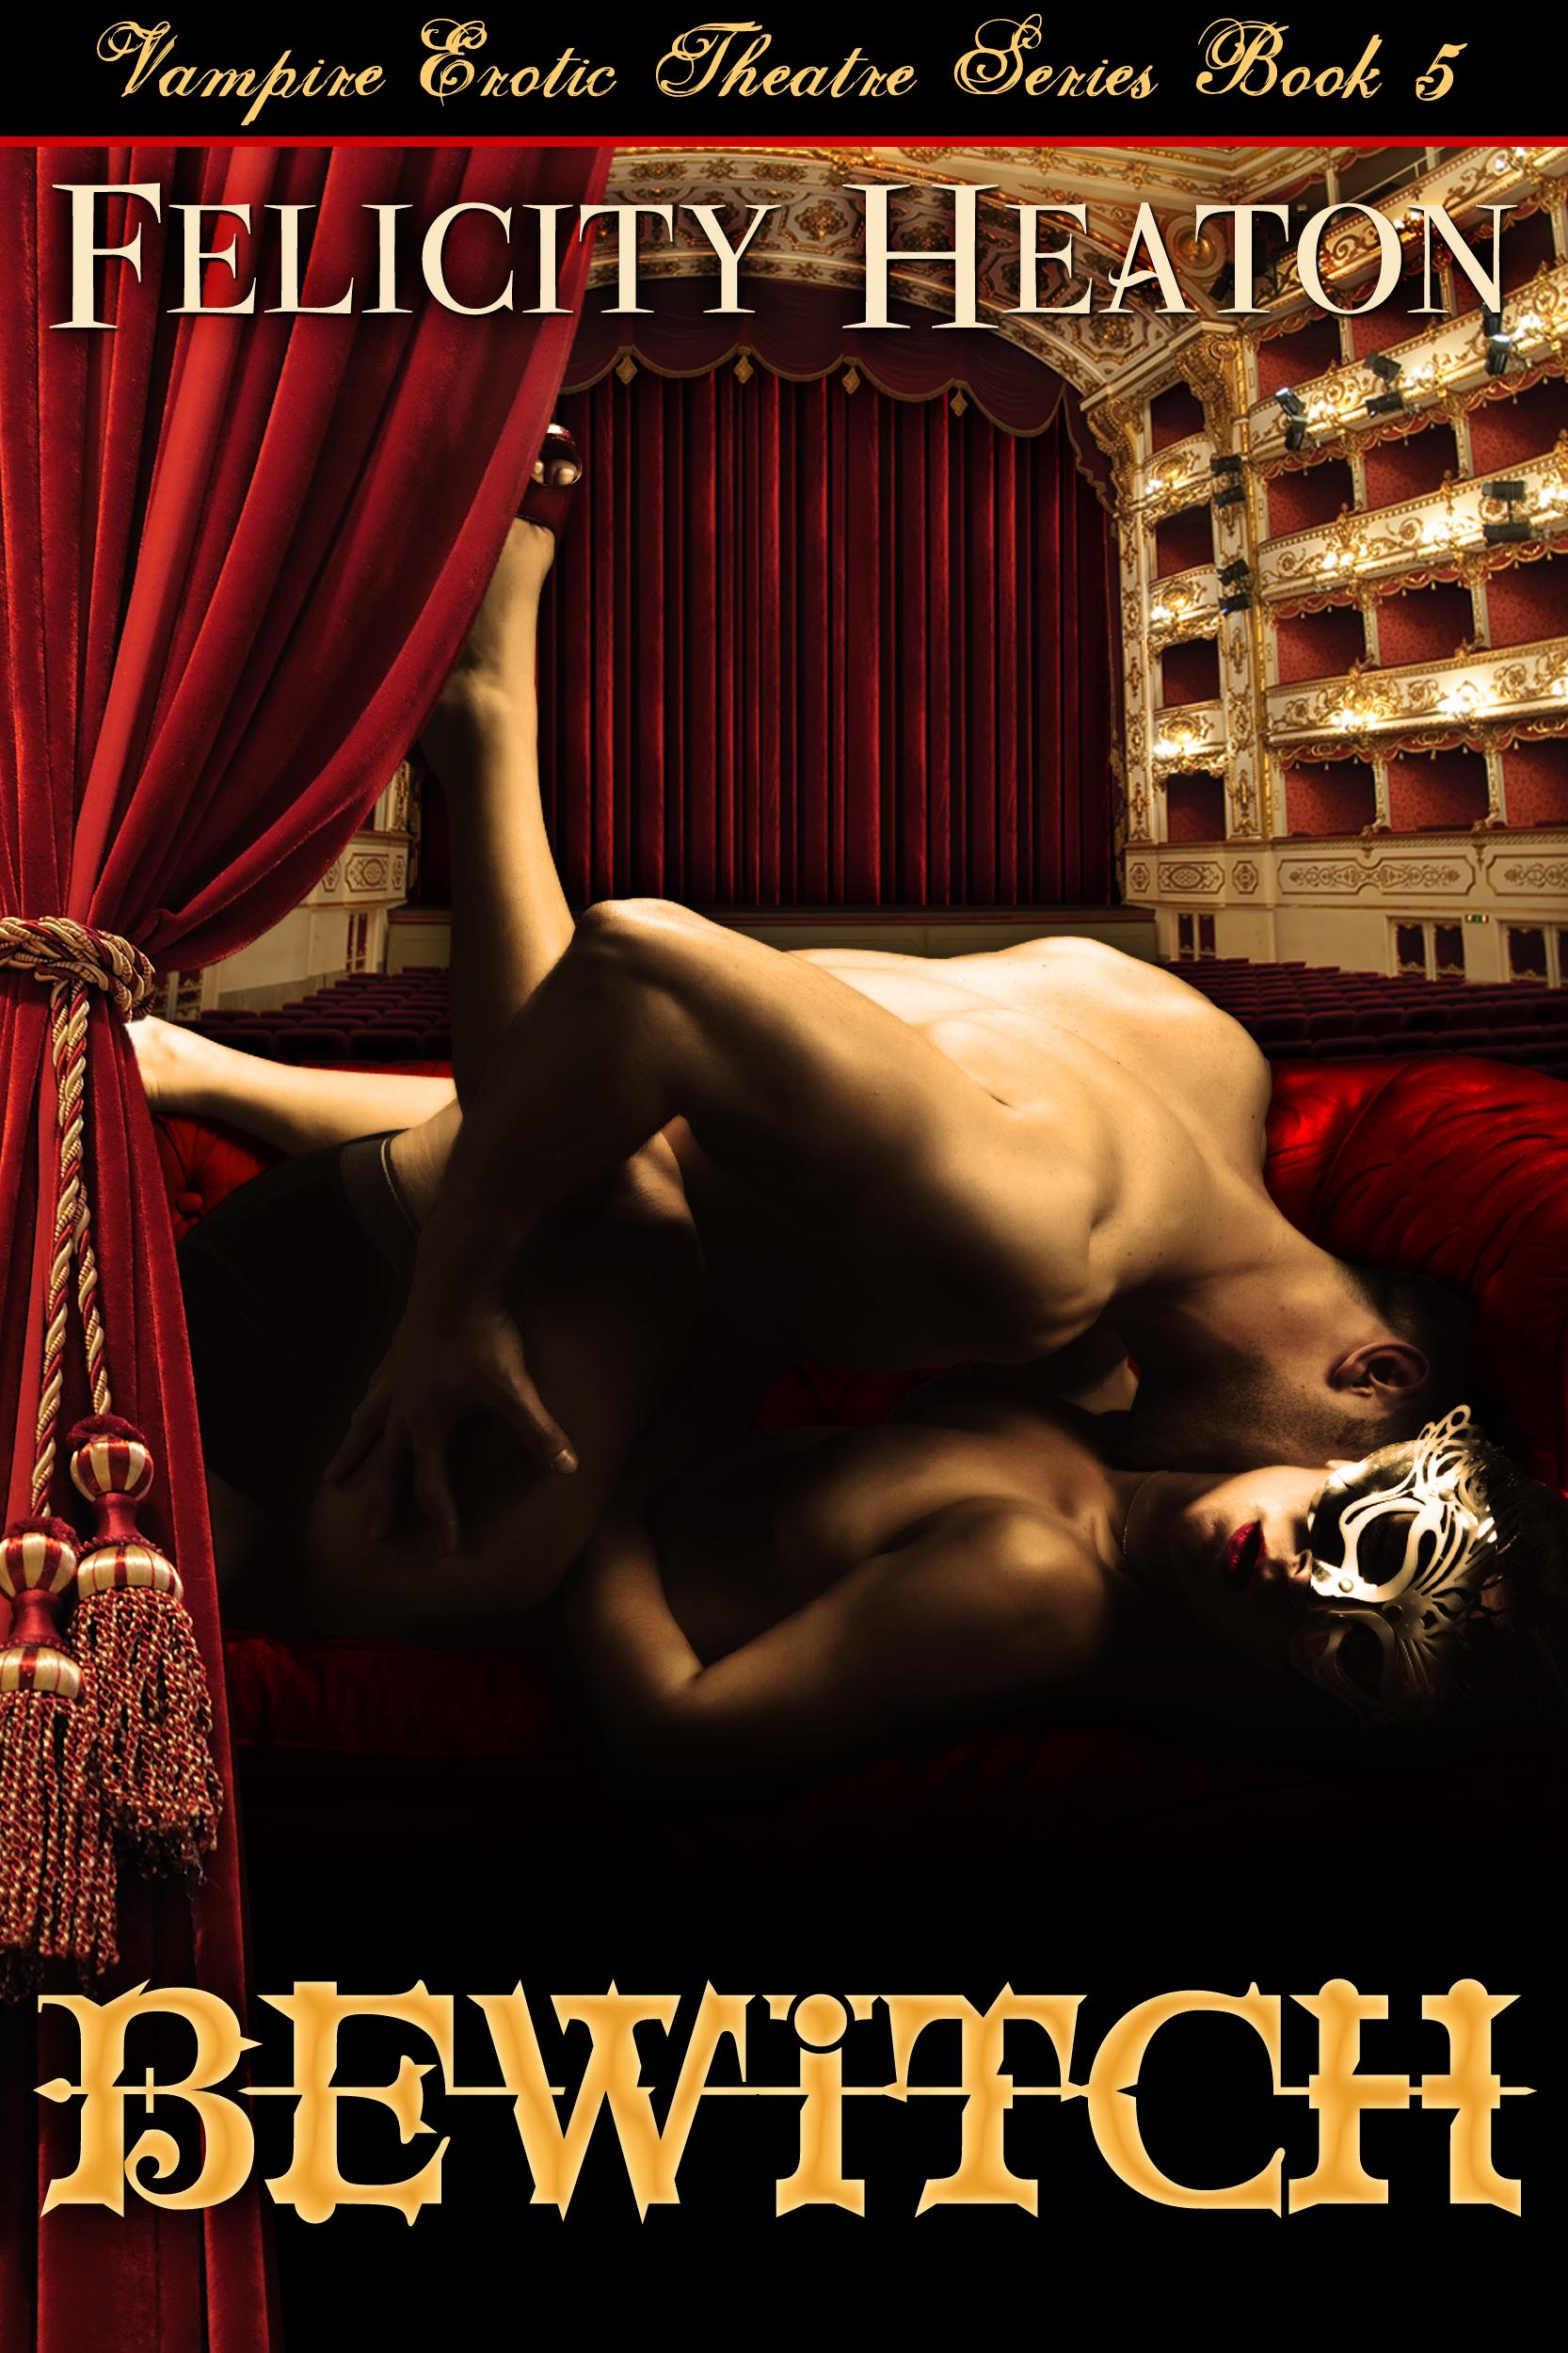 Felicity Heaton - Bewitch (Vampire Erotic Theatre Romance Series #5)